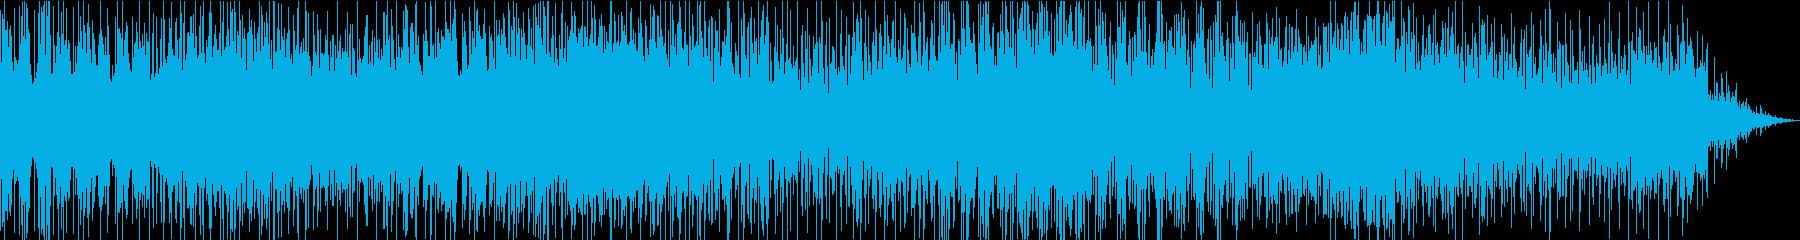 Dyson Sphereの再生済みの波形